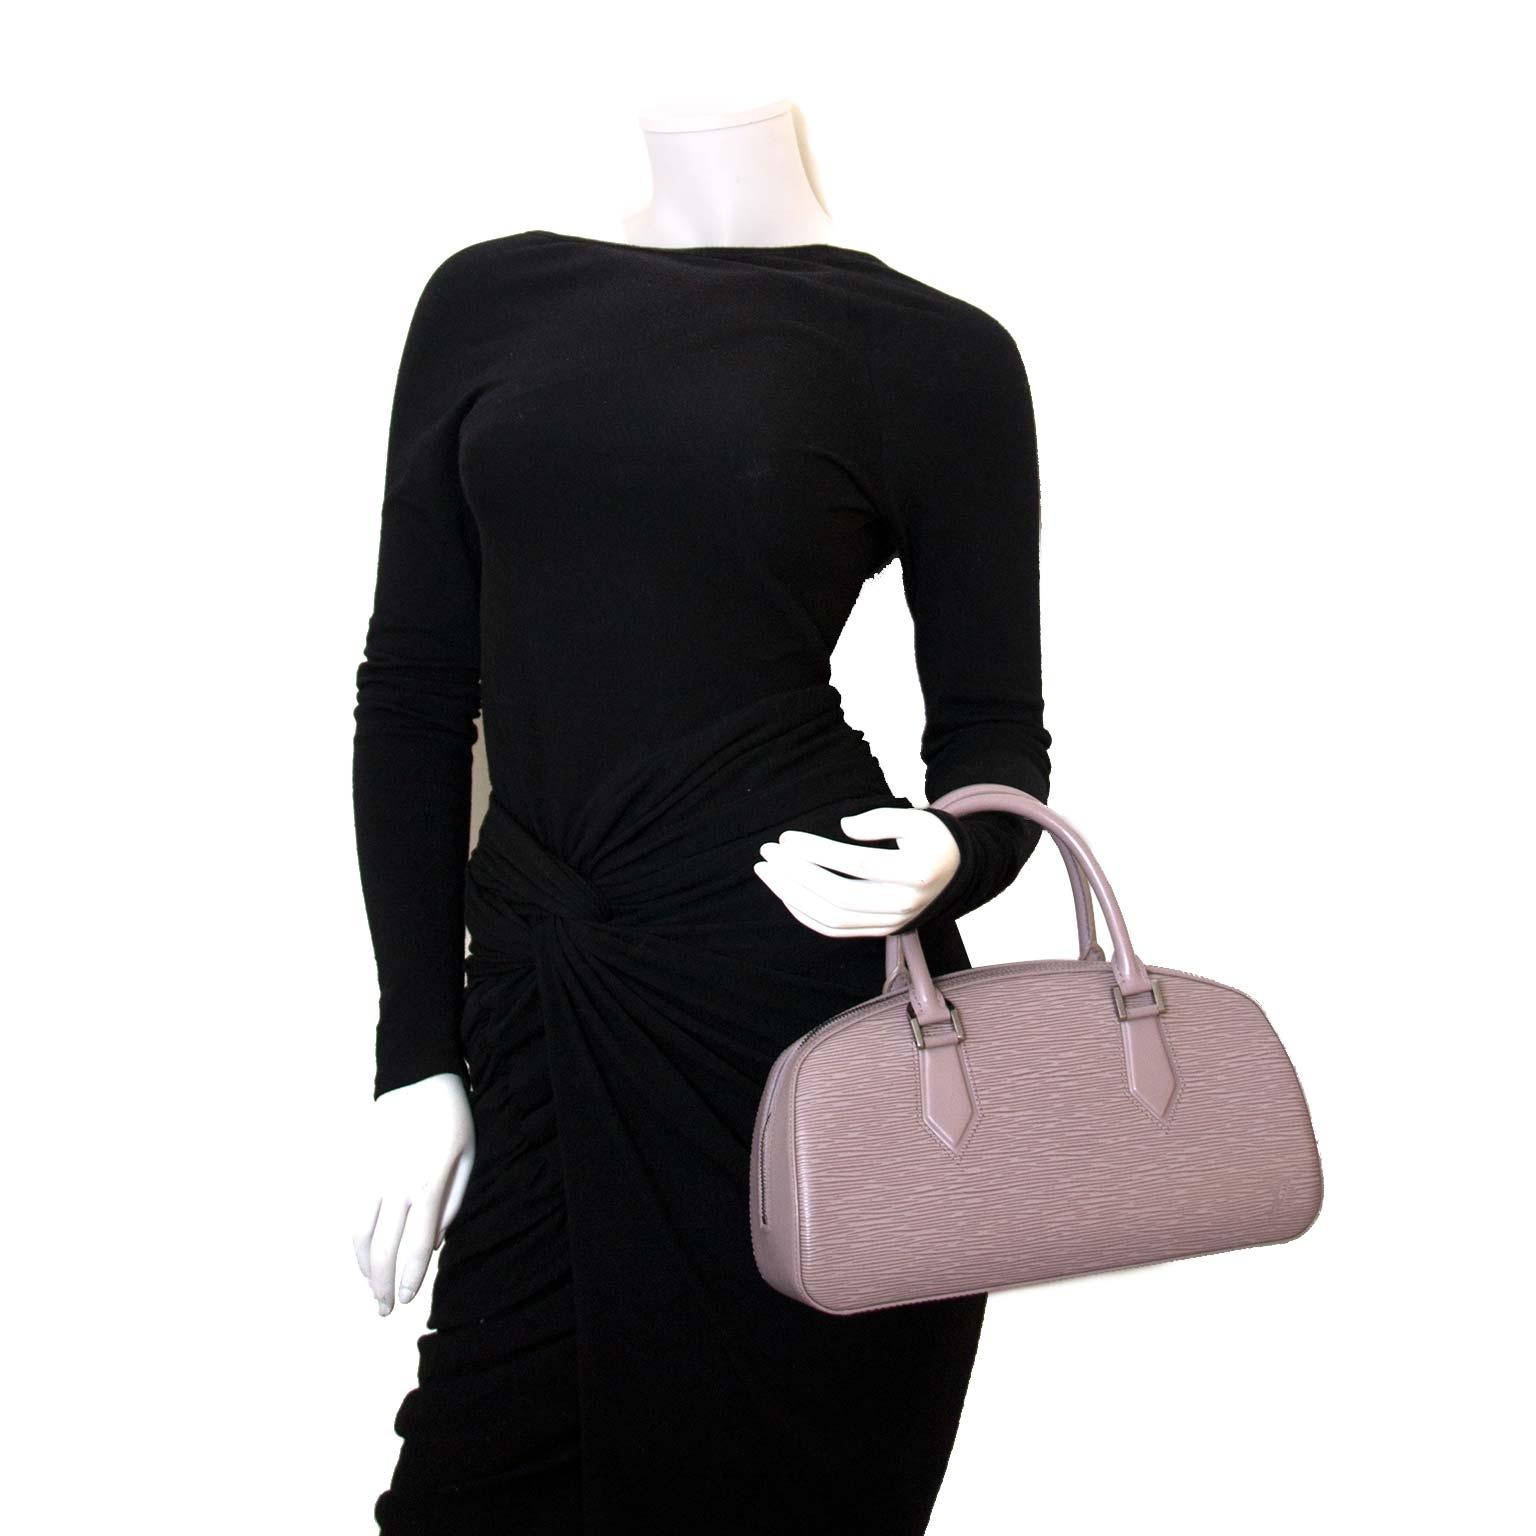 Koop authentieke Louis Vuitton Jasmin tas bij Labellov